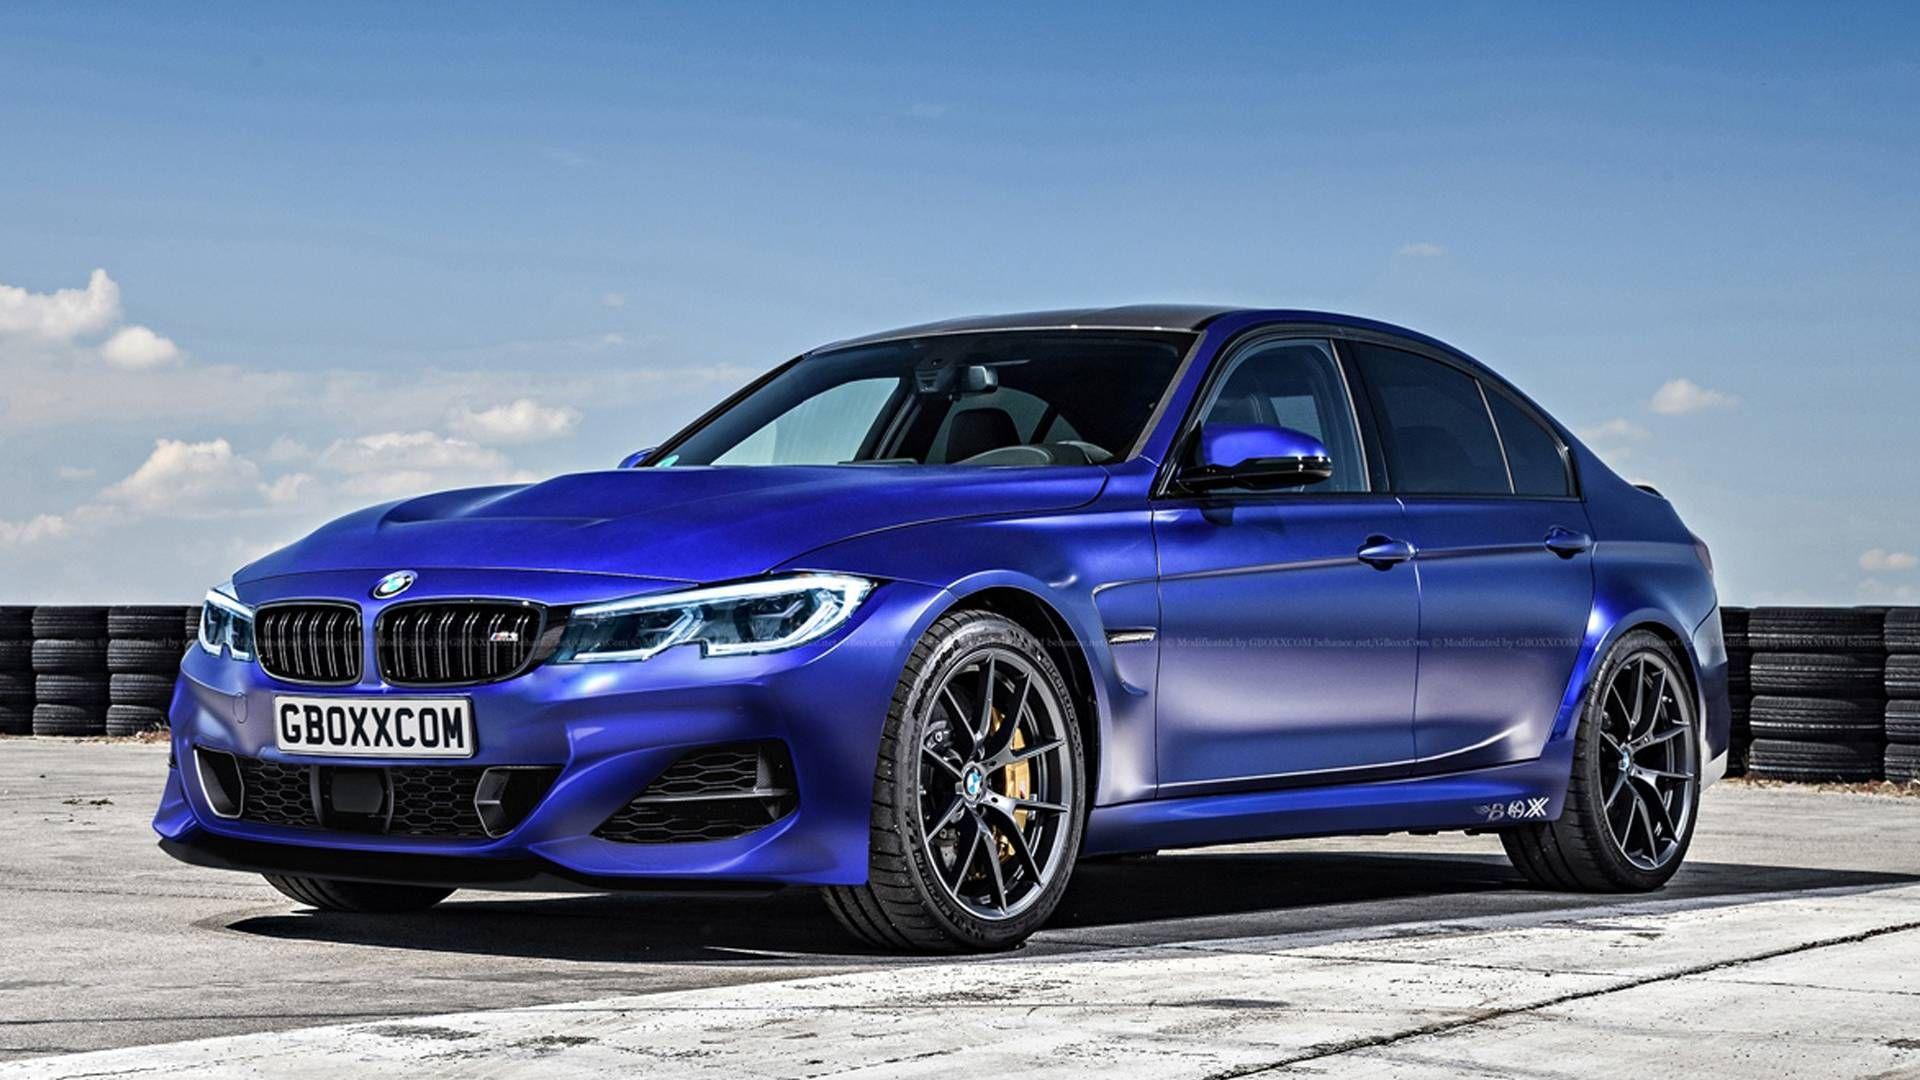 Next Gen 2020 Bmw M3 Rendered Looks Like M3 Cs With New Face Bmw Bmw M3 Bmw M3 Sport